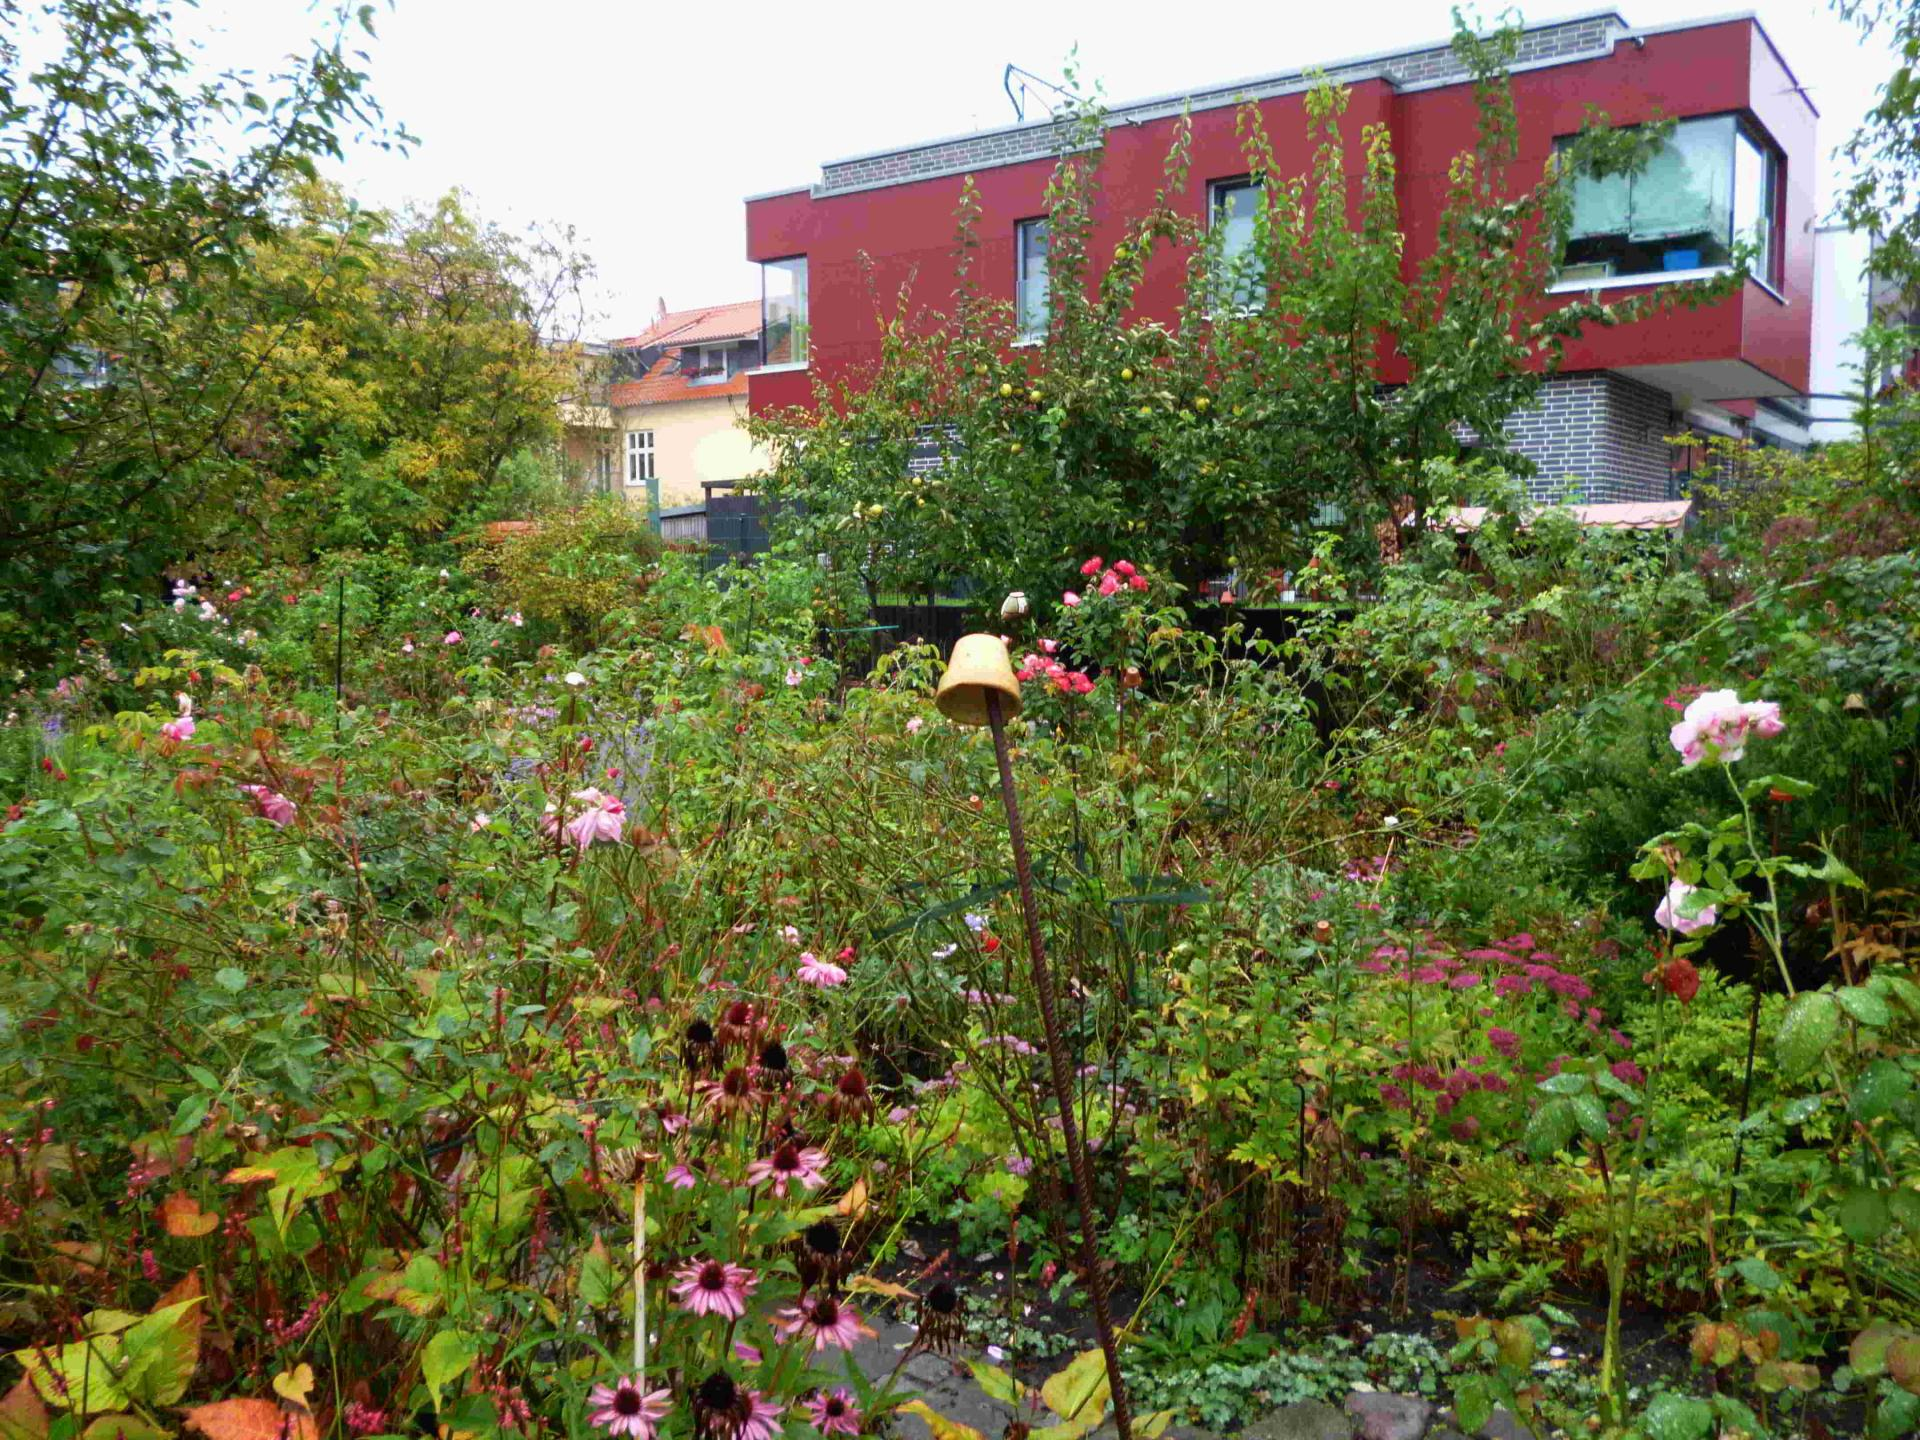 Offene Gartenpfporte 26-09-2020 Bild 18